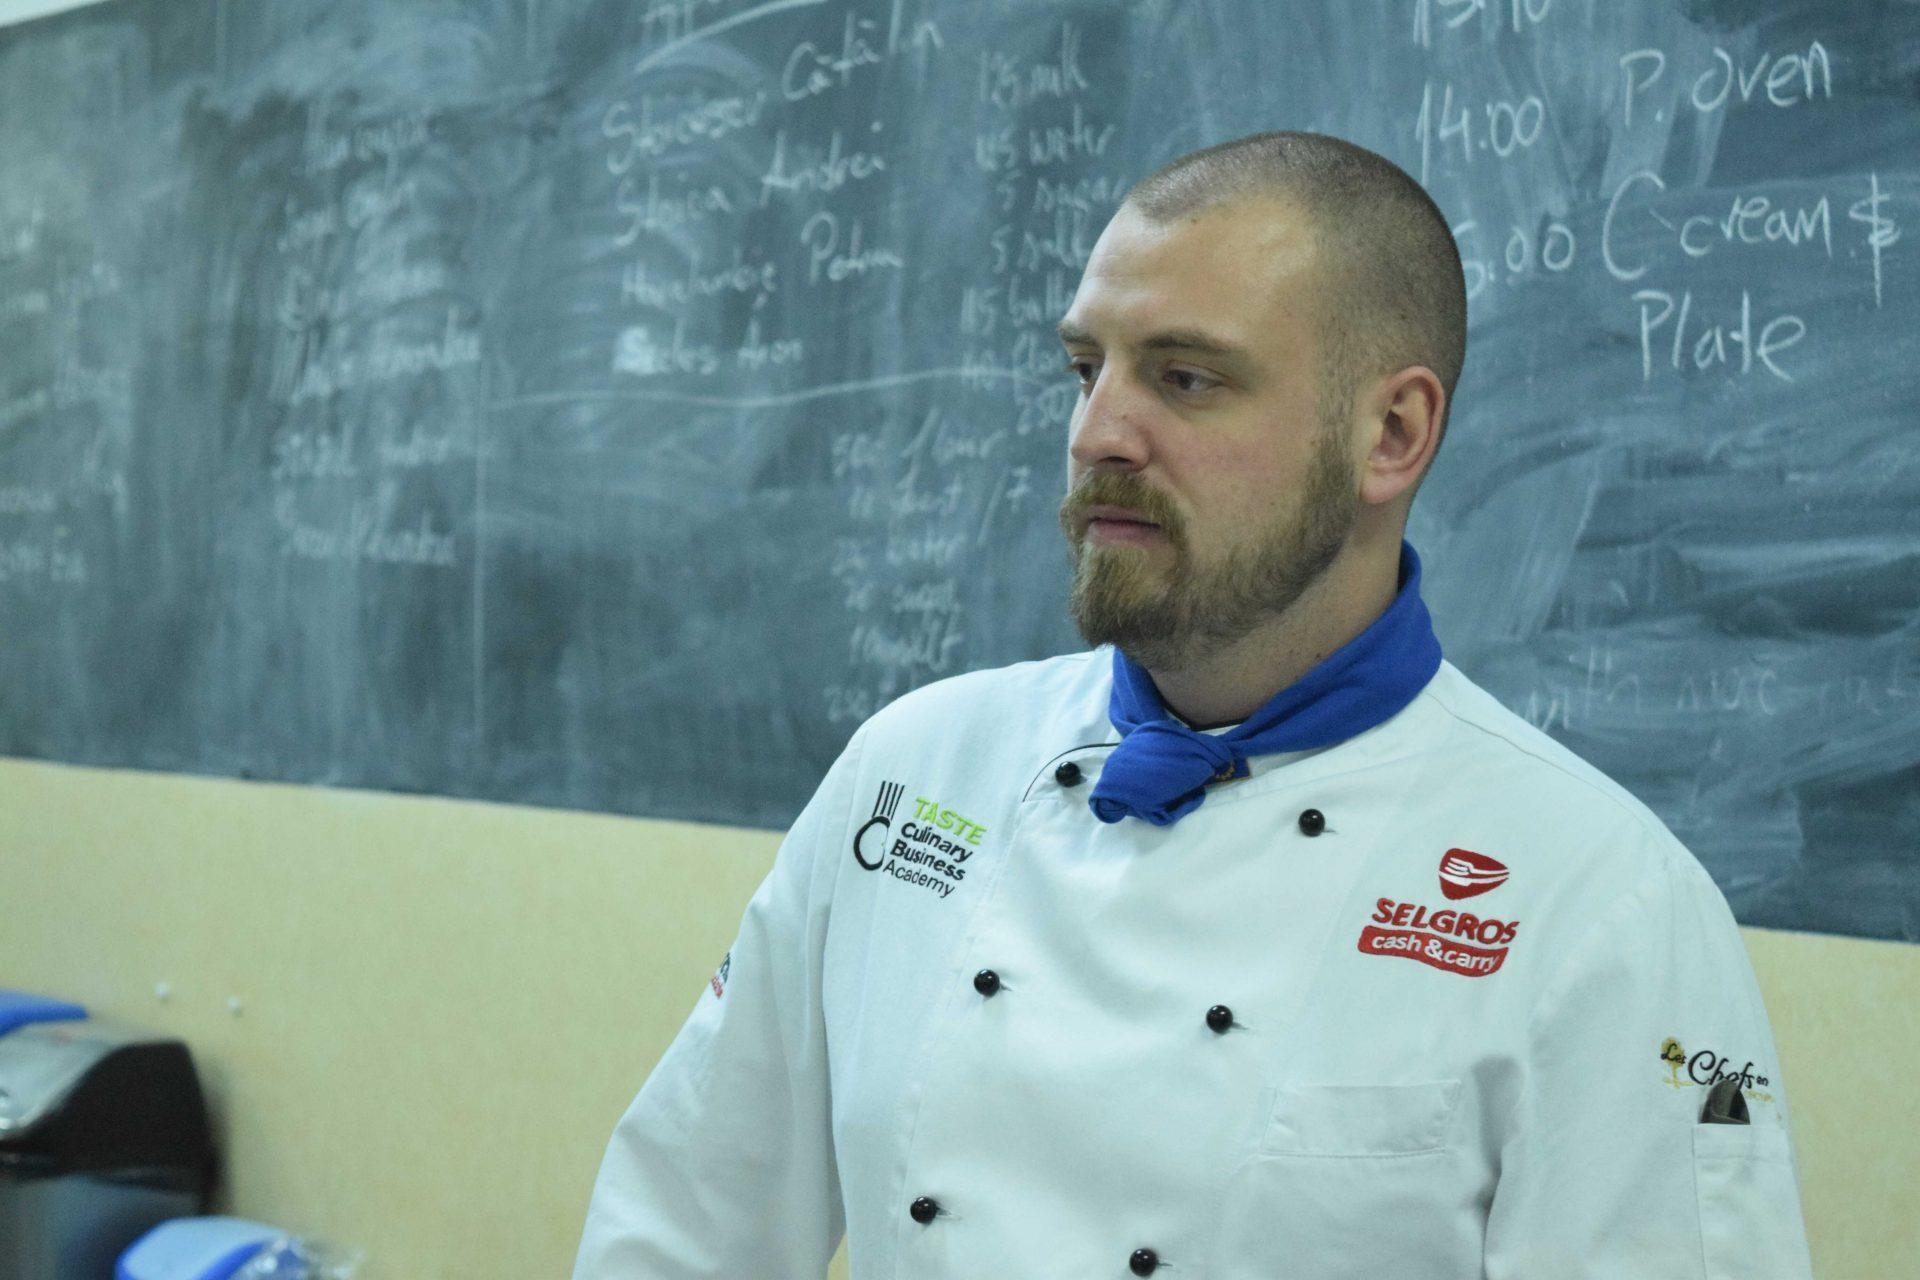 chef jon jordache portrait during class in front of practice kitchen blackboard